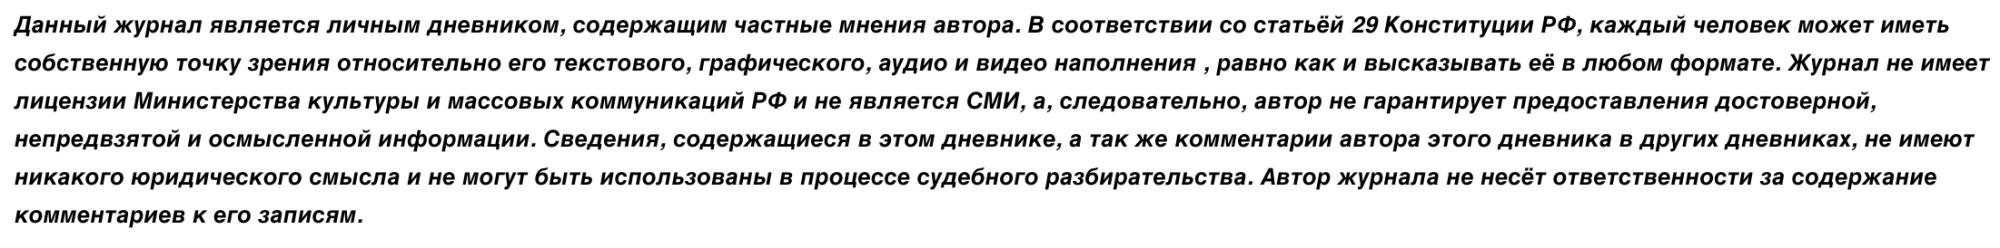 Гордон: